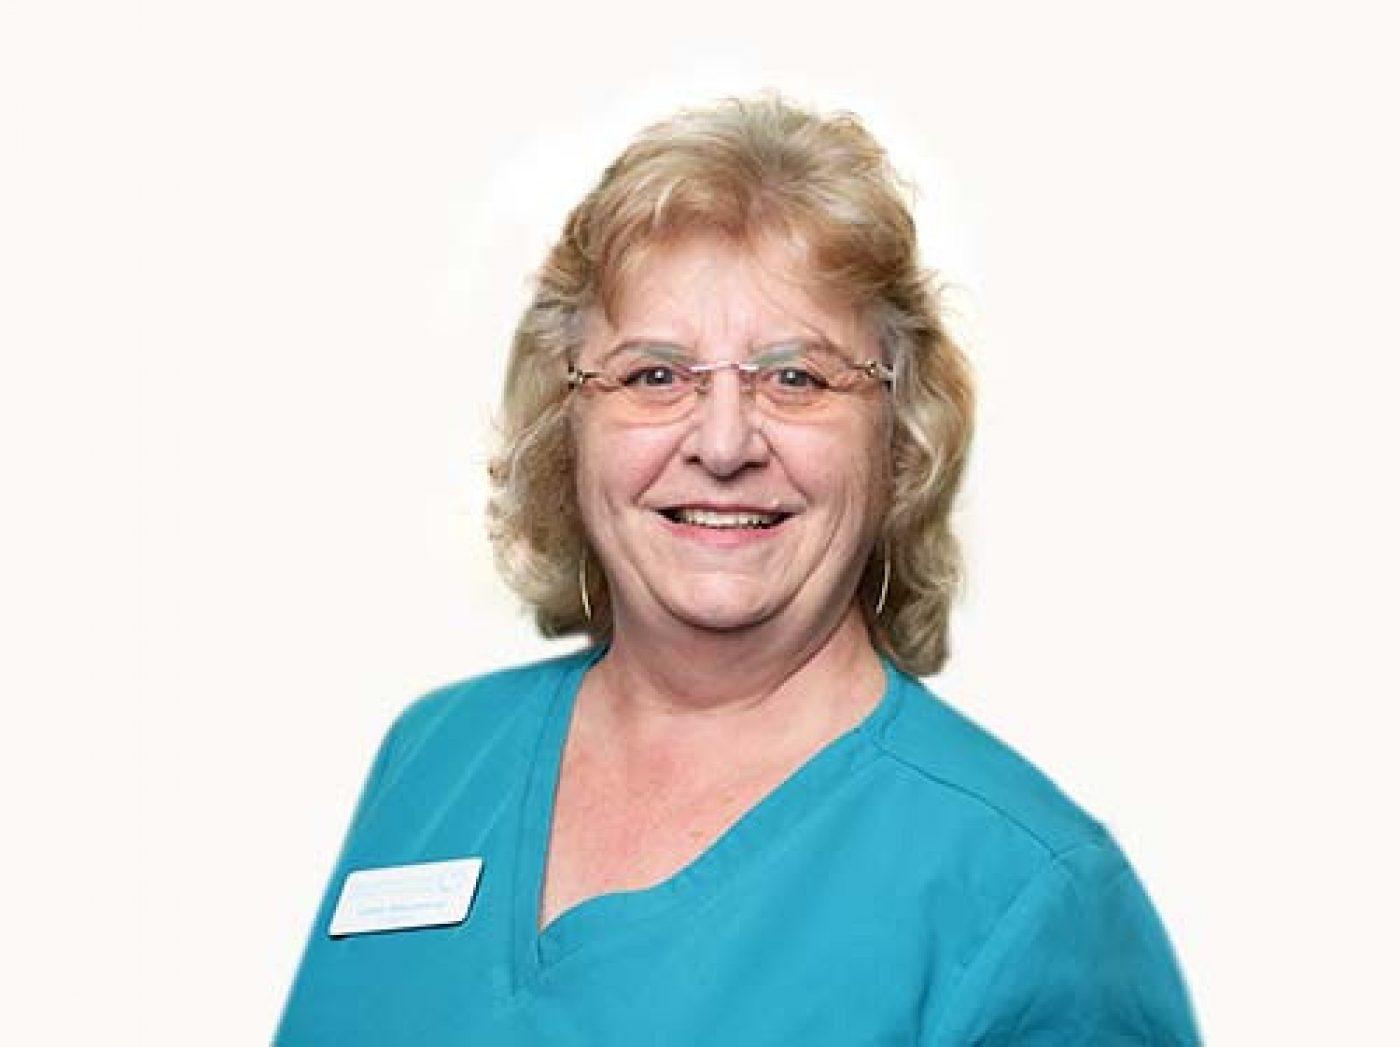 Pdc0306 Jane Sherwood